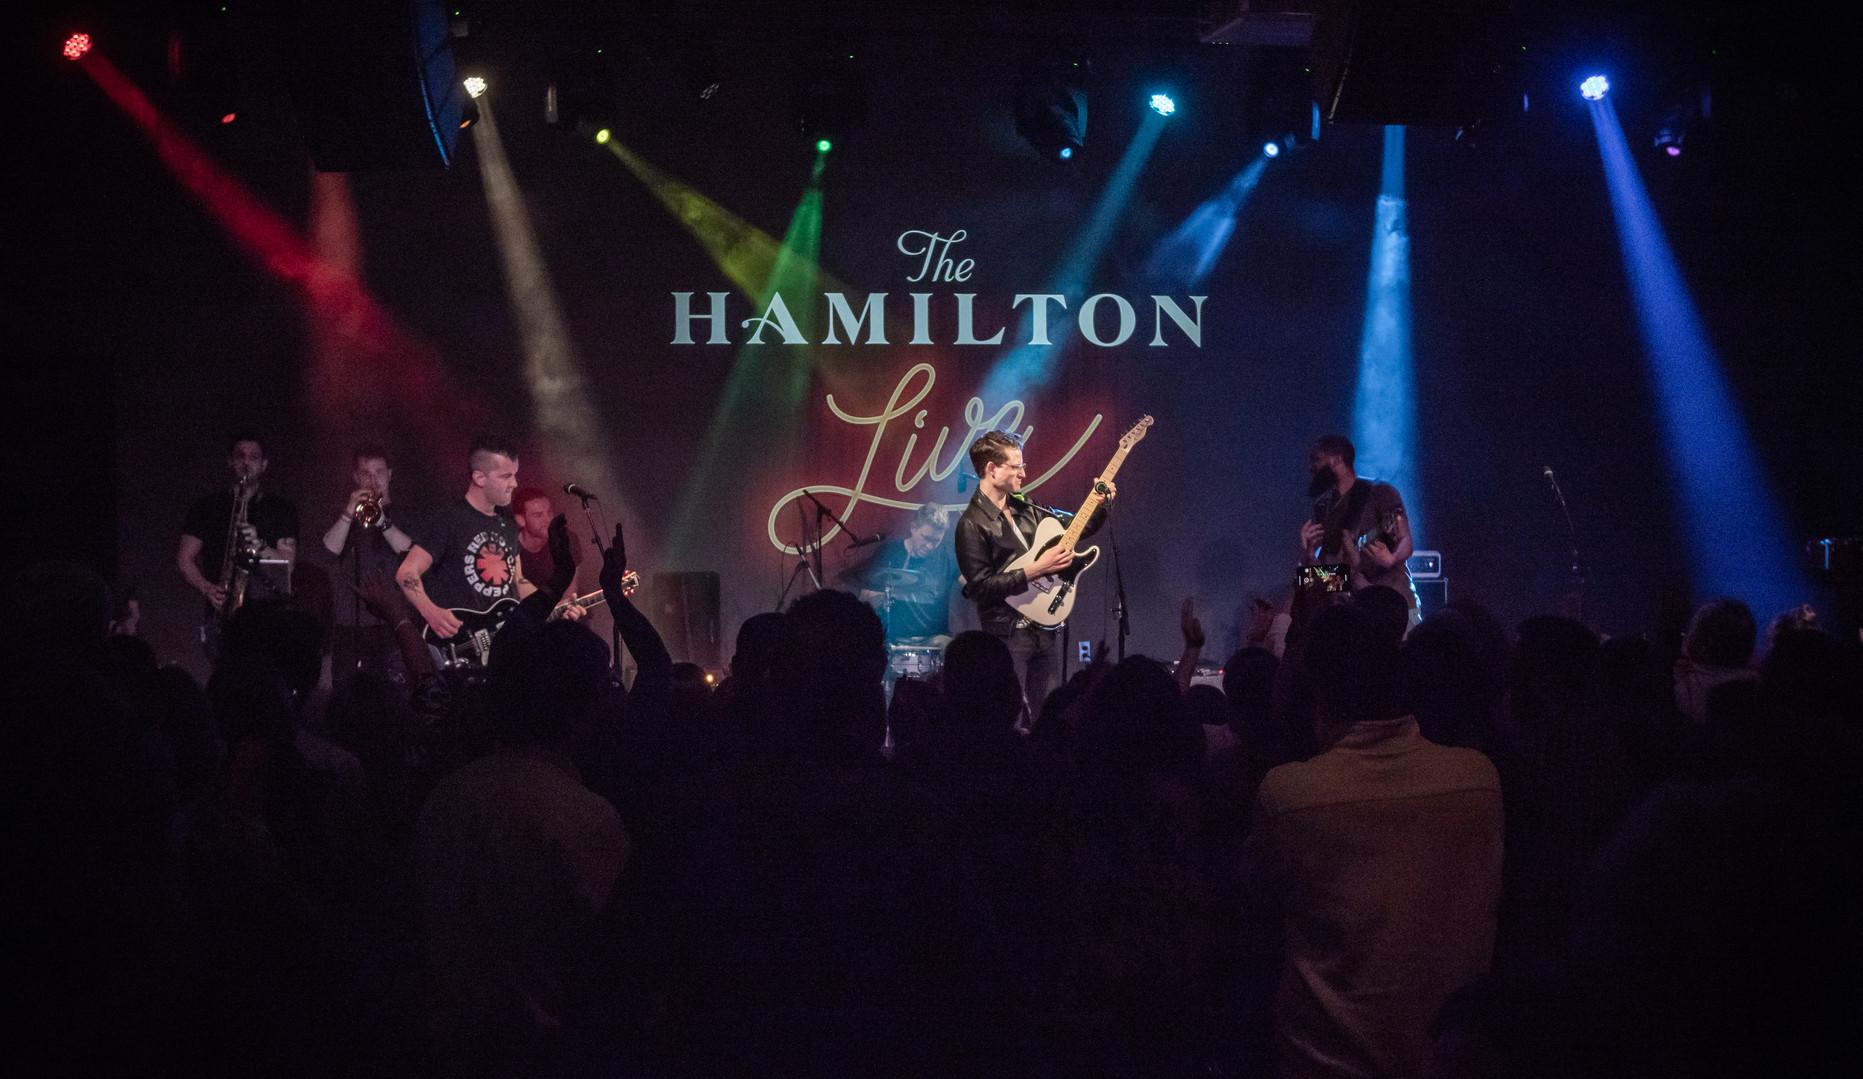 Drew Angus _ The Hamilton-26.jpg